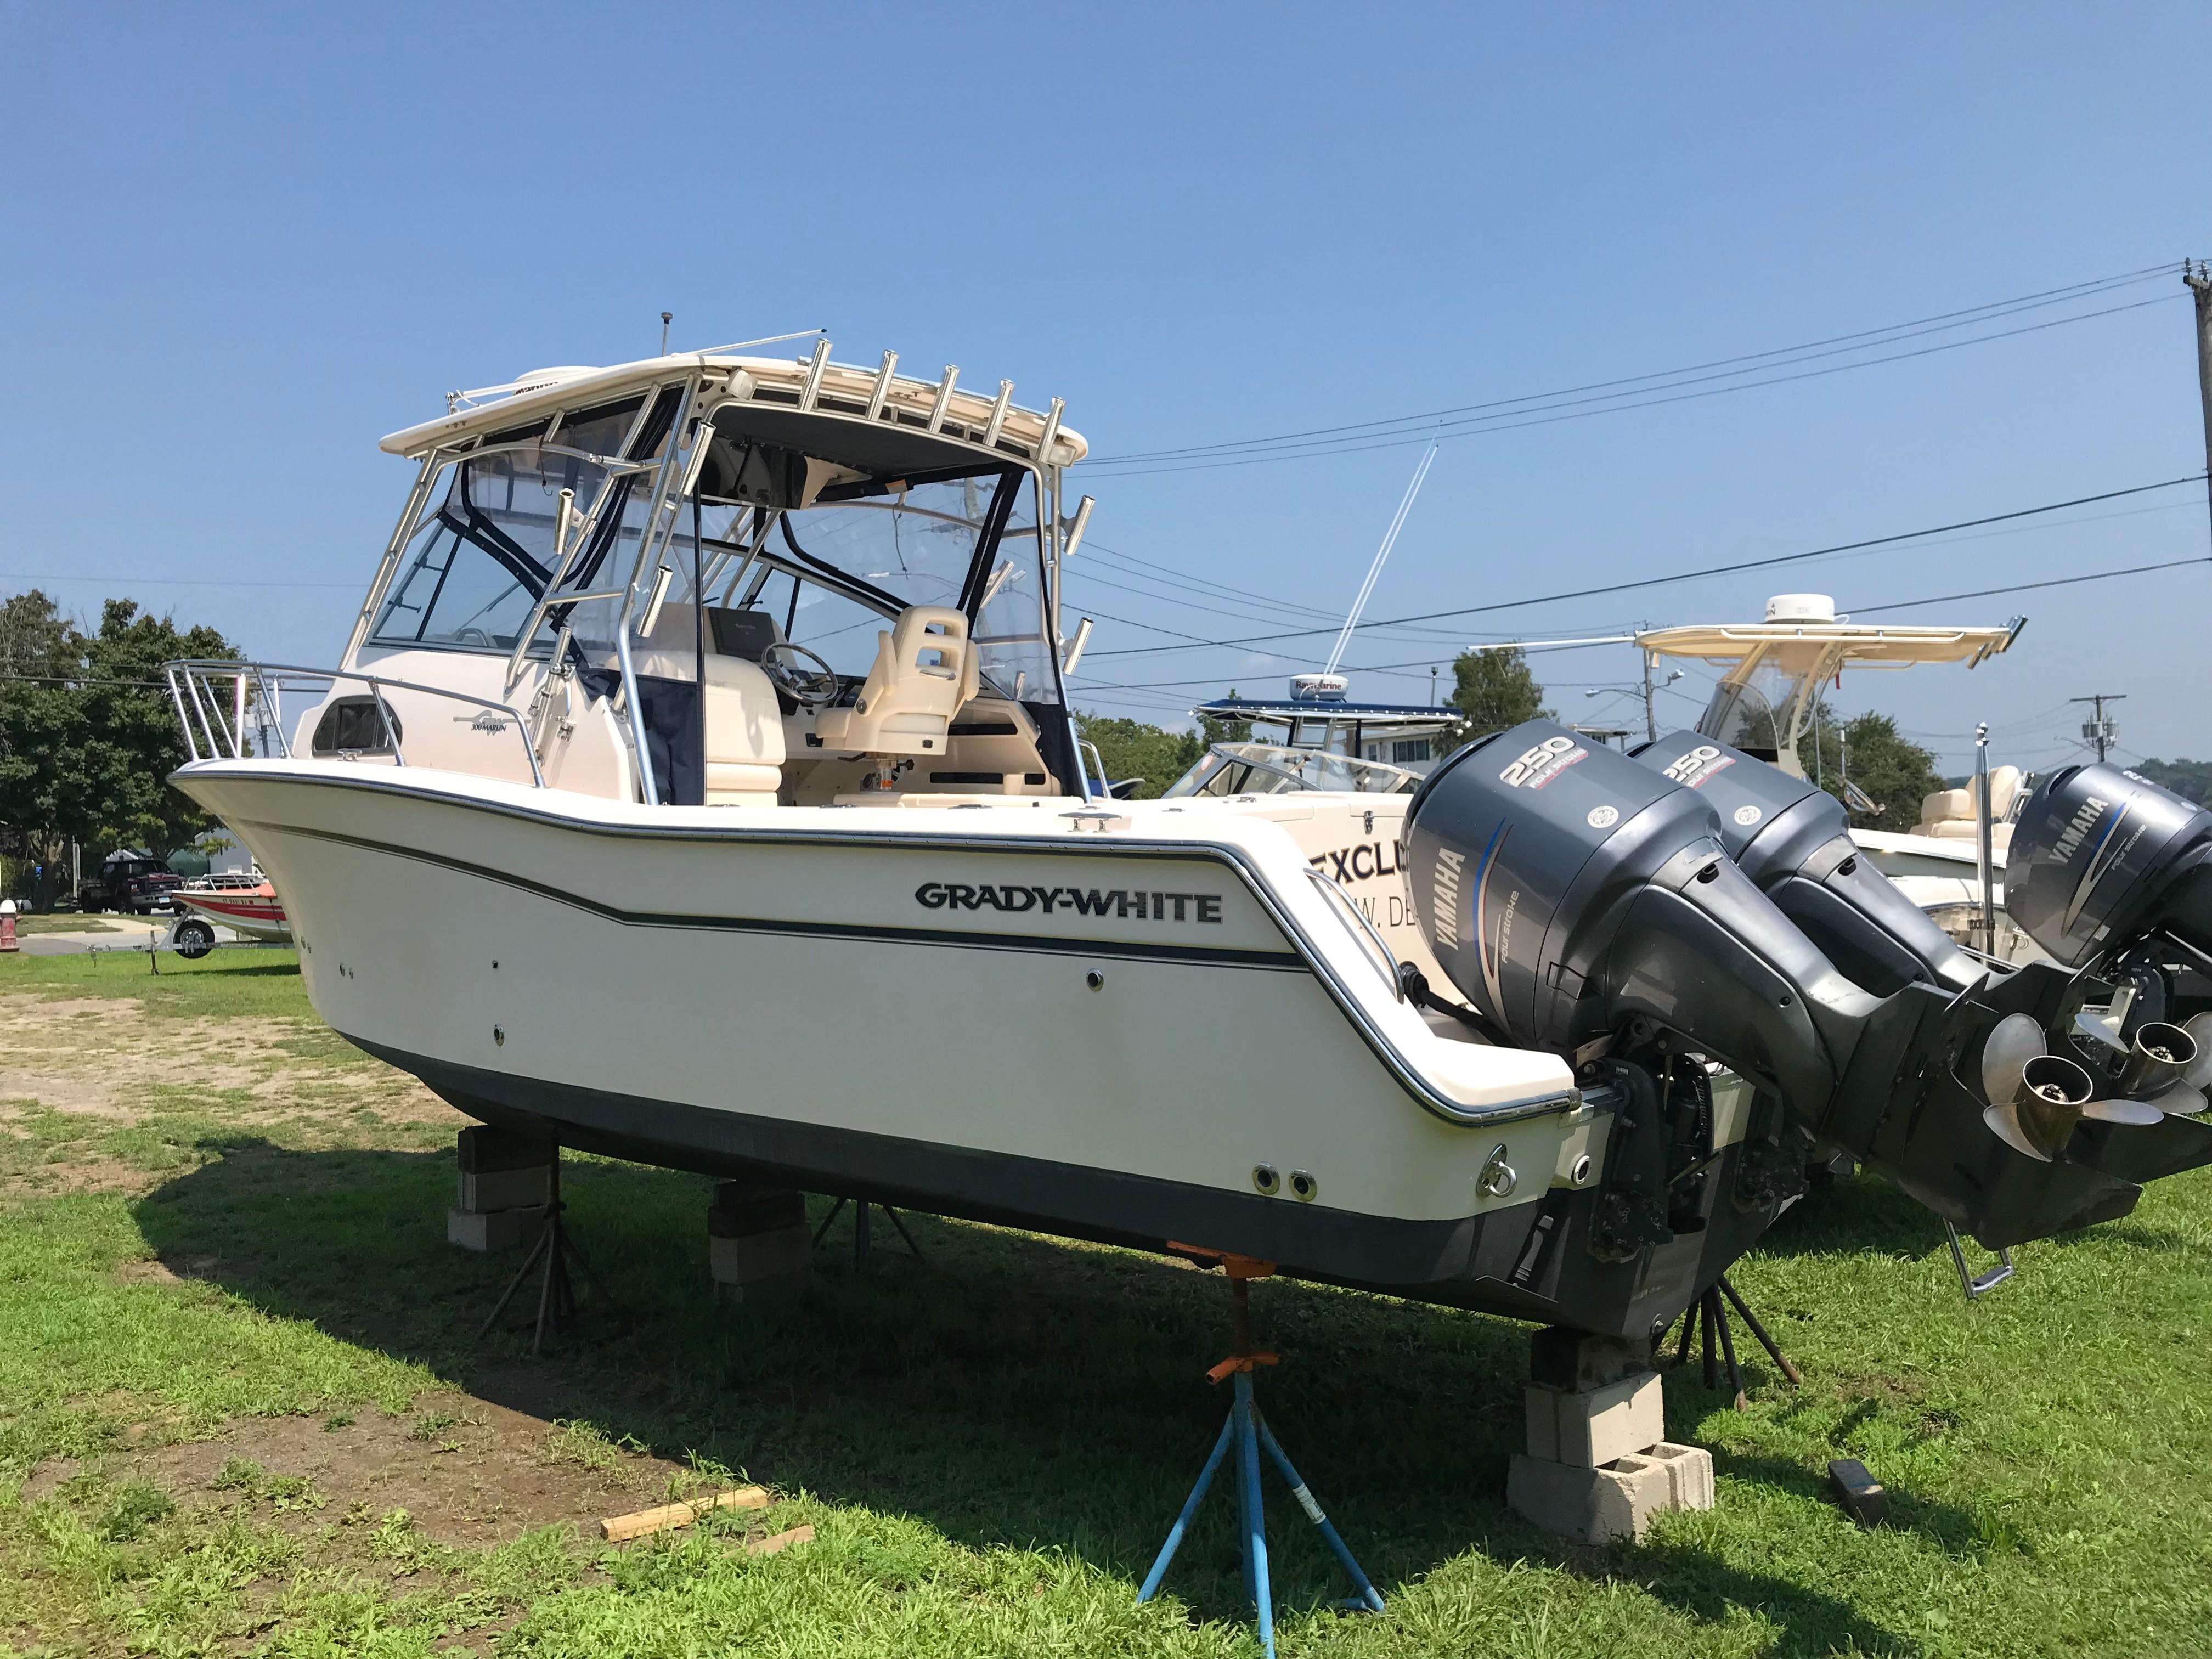 Grady-White300 Marlin